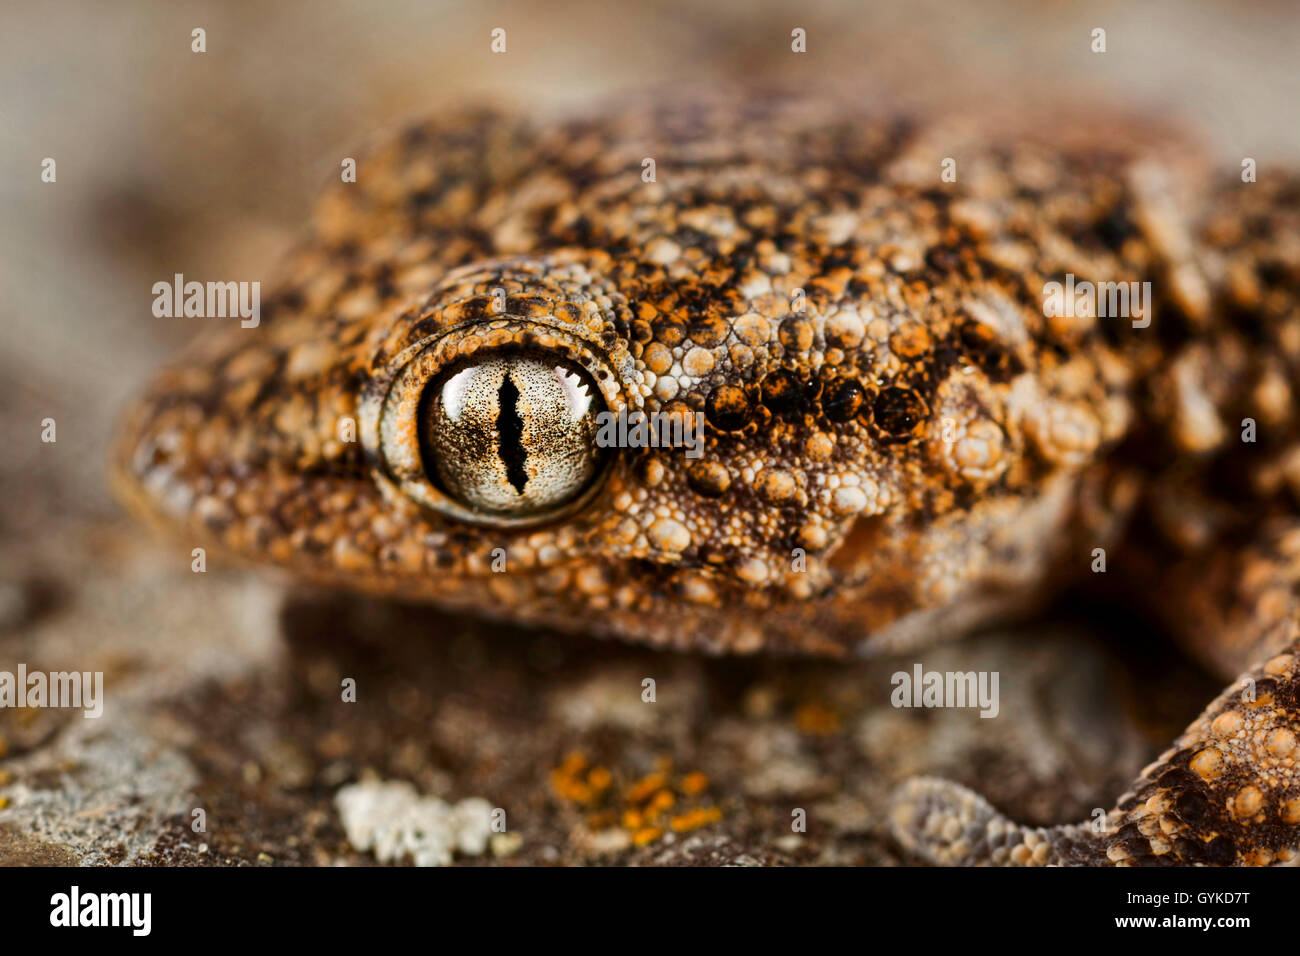 Geckos (Gekkonidae), Kopf eines Geckos | geckos (Gekkonidae), head of a gecko | BLWS418797.jpg [ (c) blickwinkel/F. - Stock Image